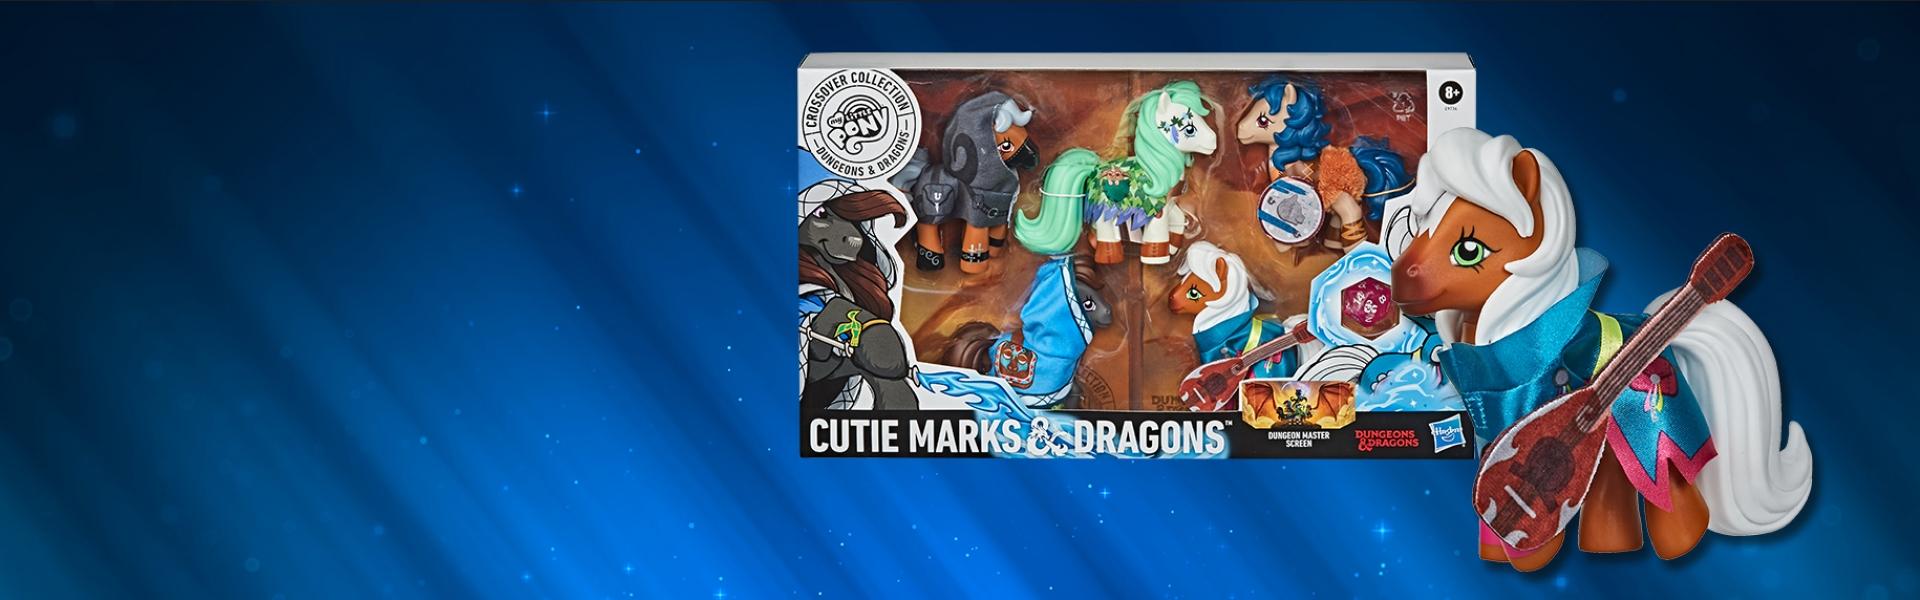 Cutie Marks & Dragons